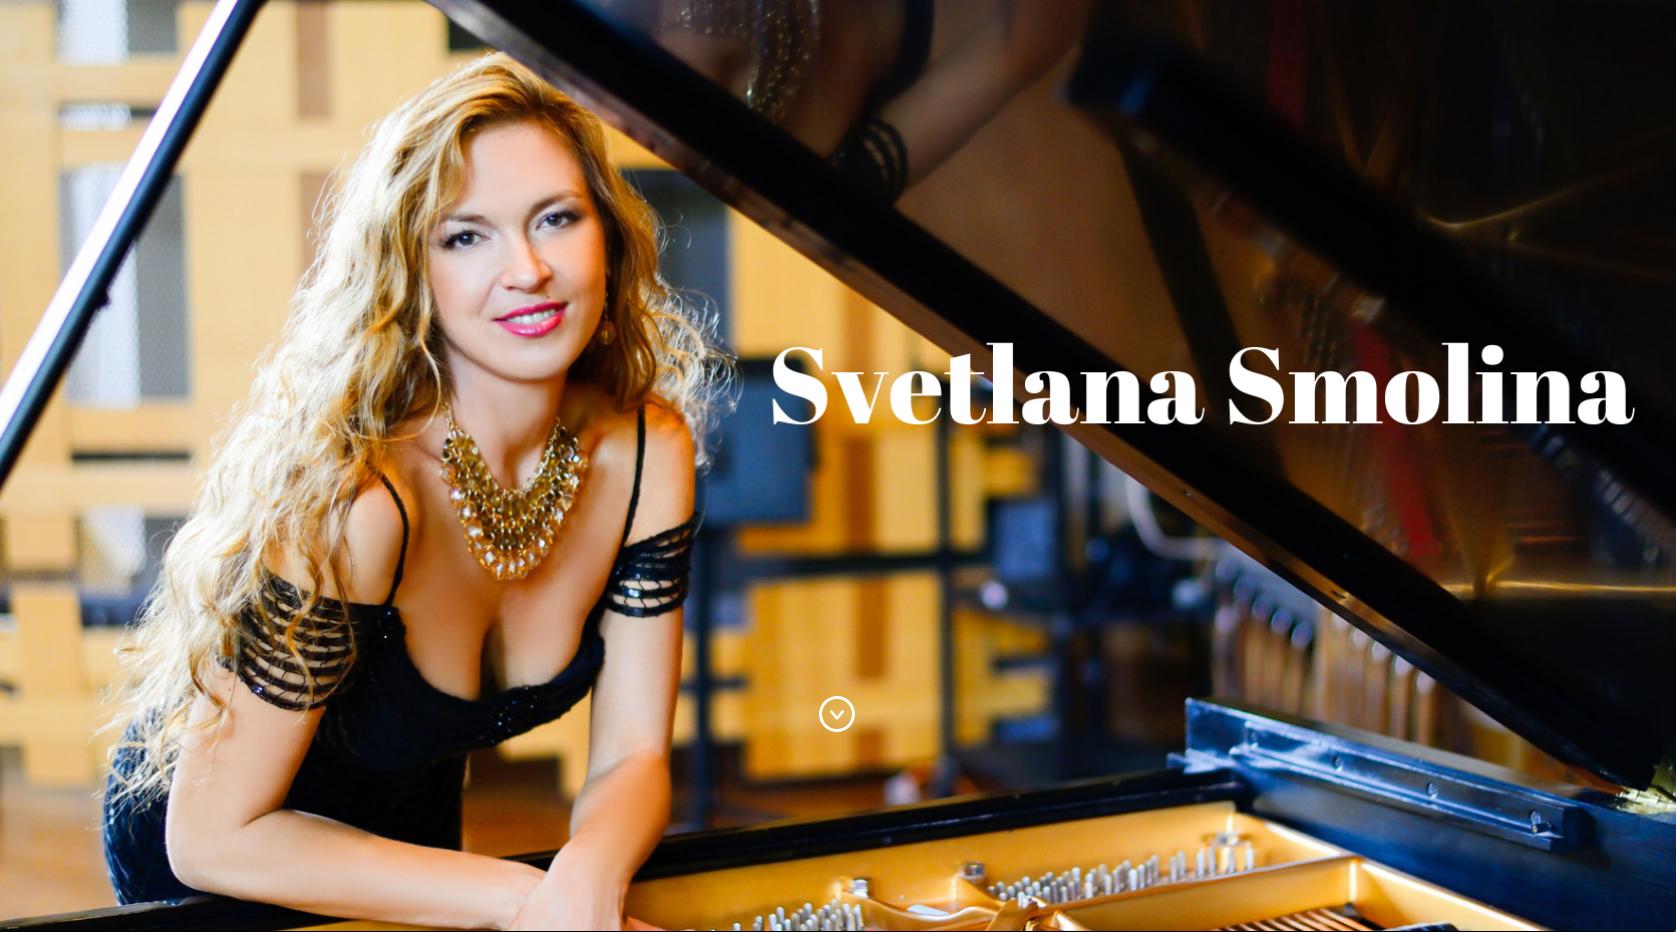 Screen-Shot-2014-02-12-at-6.42.44-PM SVETLANA SMOLINA WEBSITE